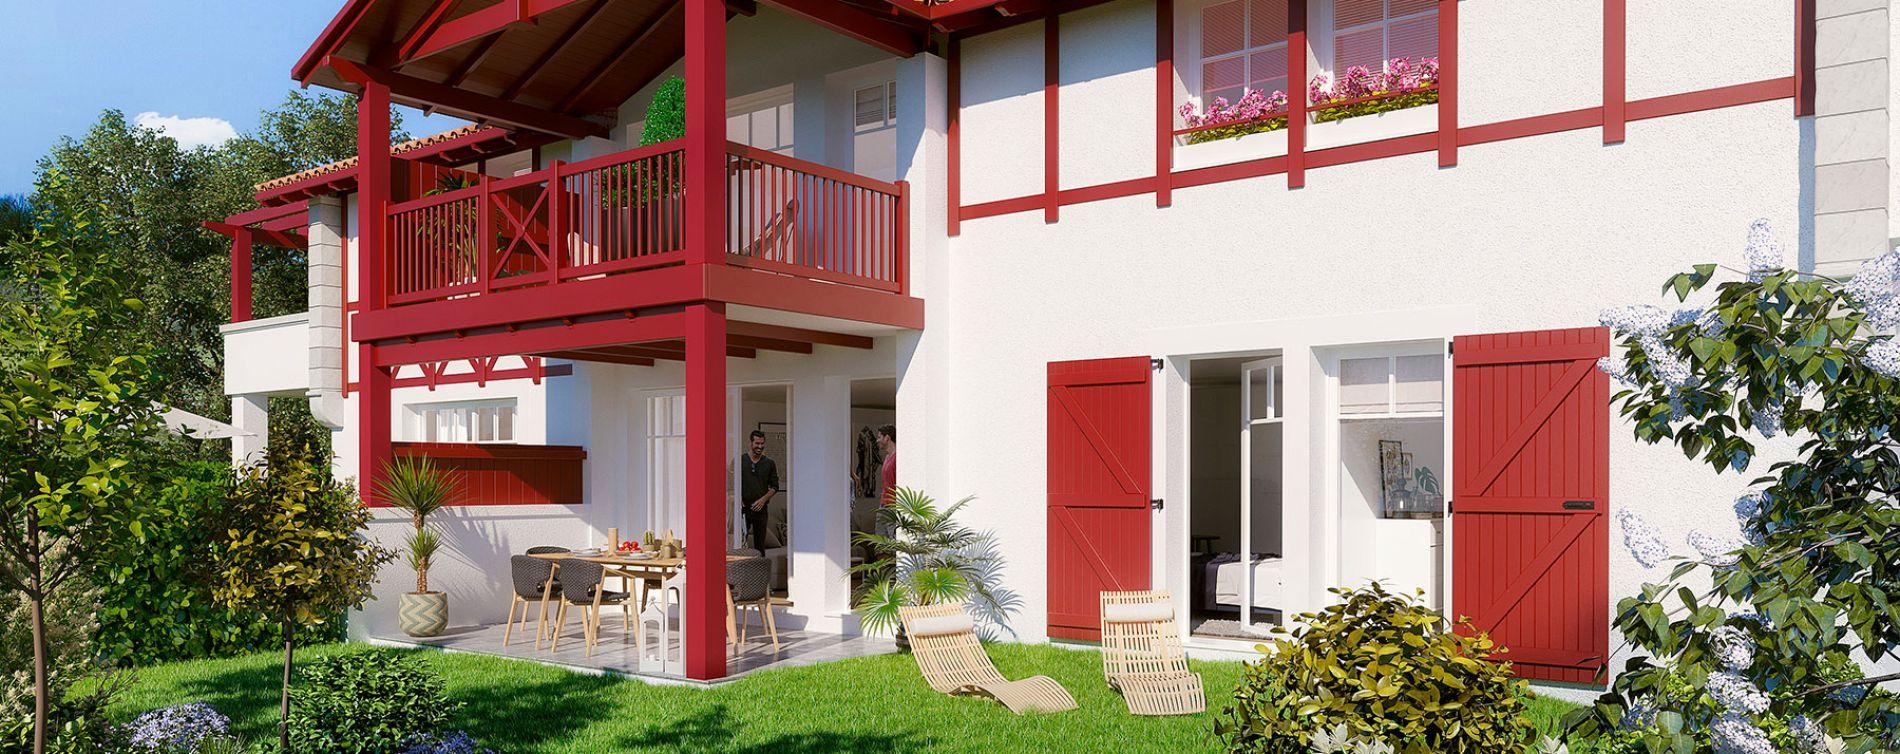 Résidence Villa Ama à Saint-Jean-de-Luz